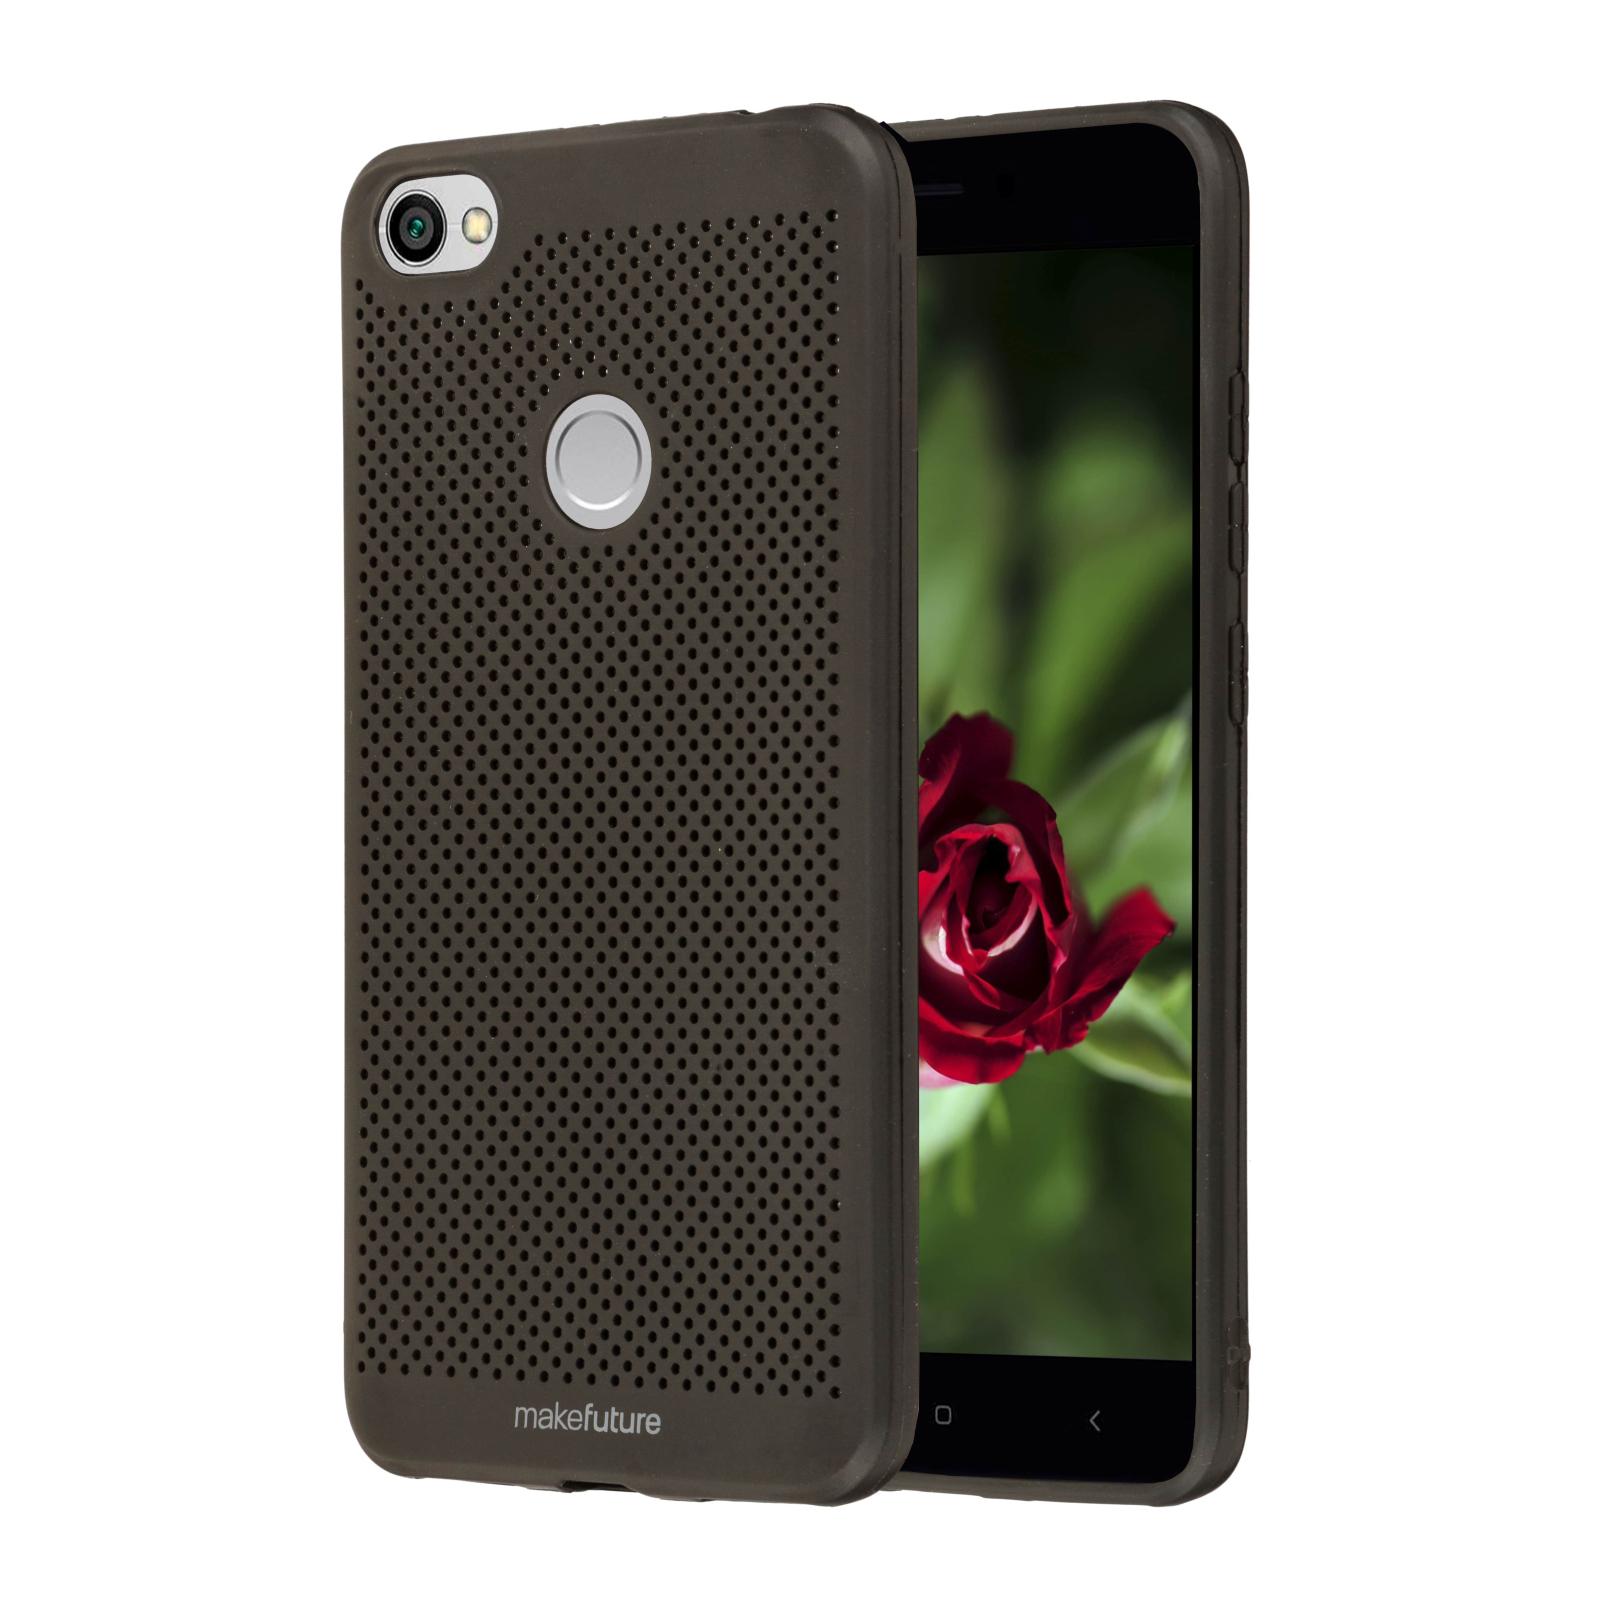 Чехол для моб. телефона MakeFuture TPU/Moon Case для Xiaomi Redmi Note 5A Prime Black (MCM-XRN5APBK) изображение 2